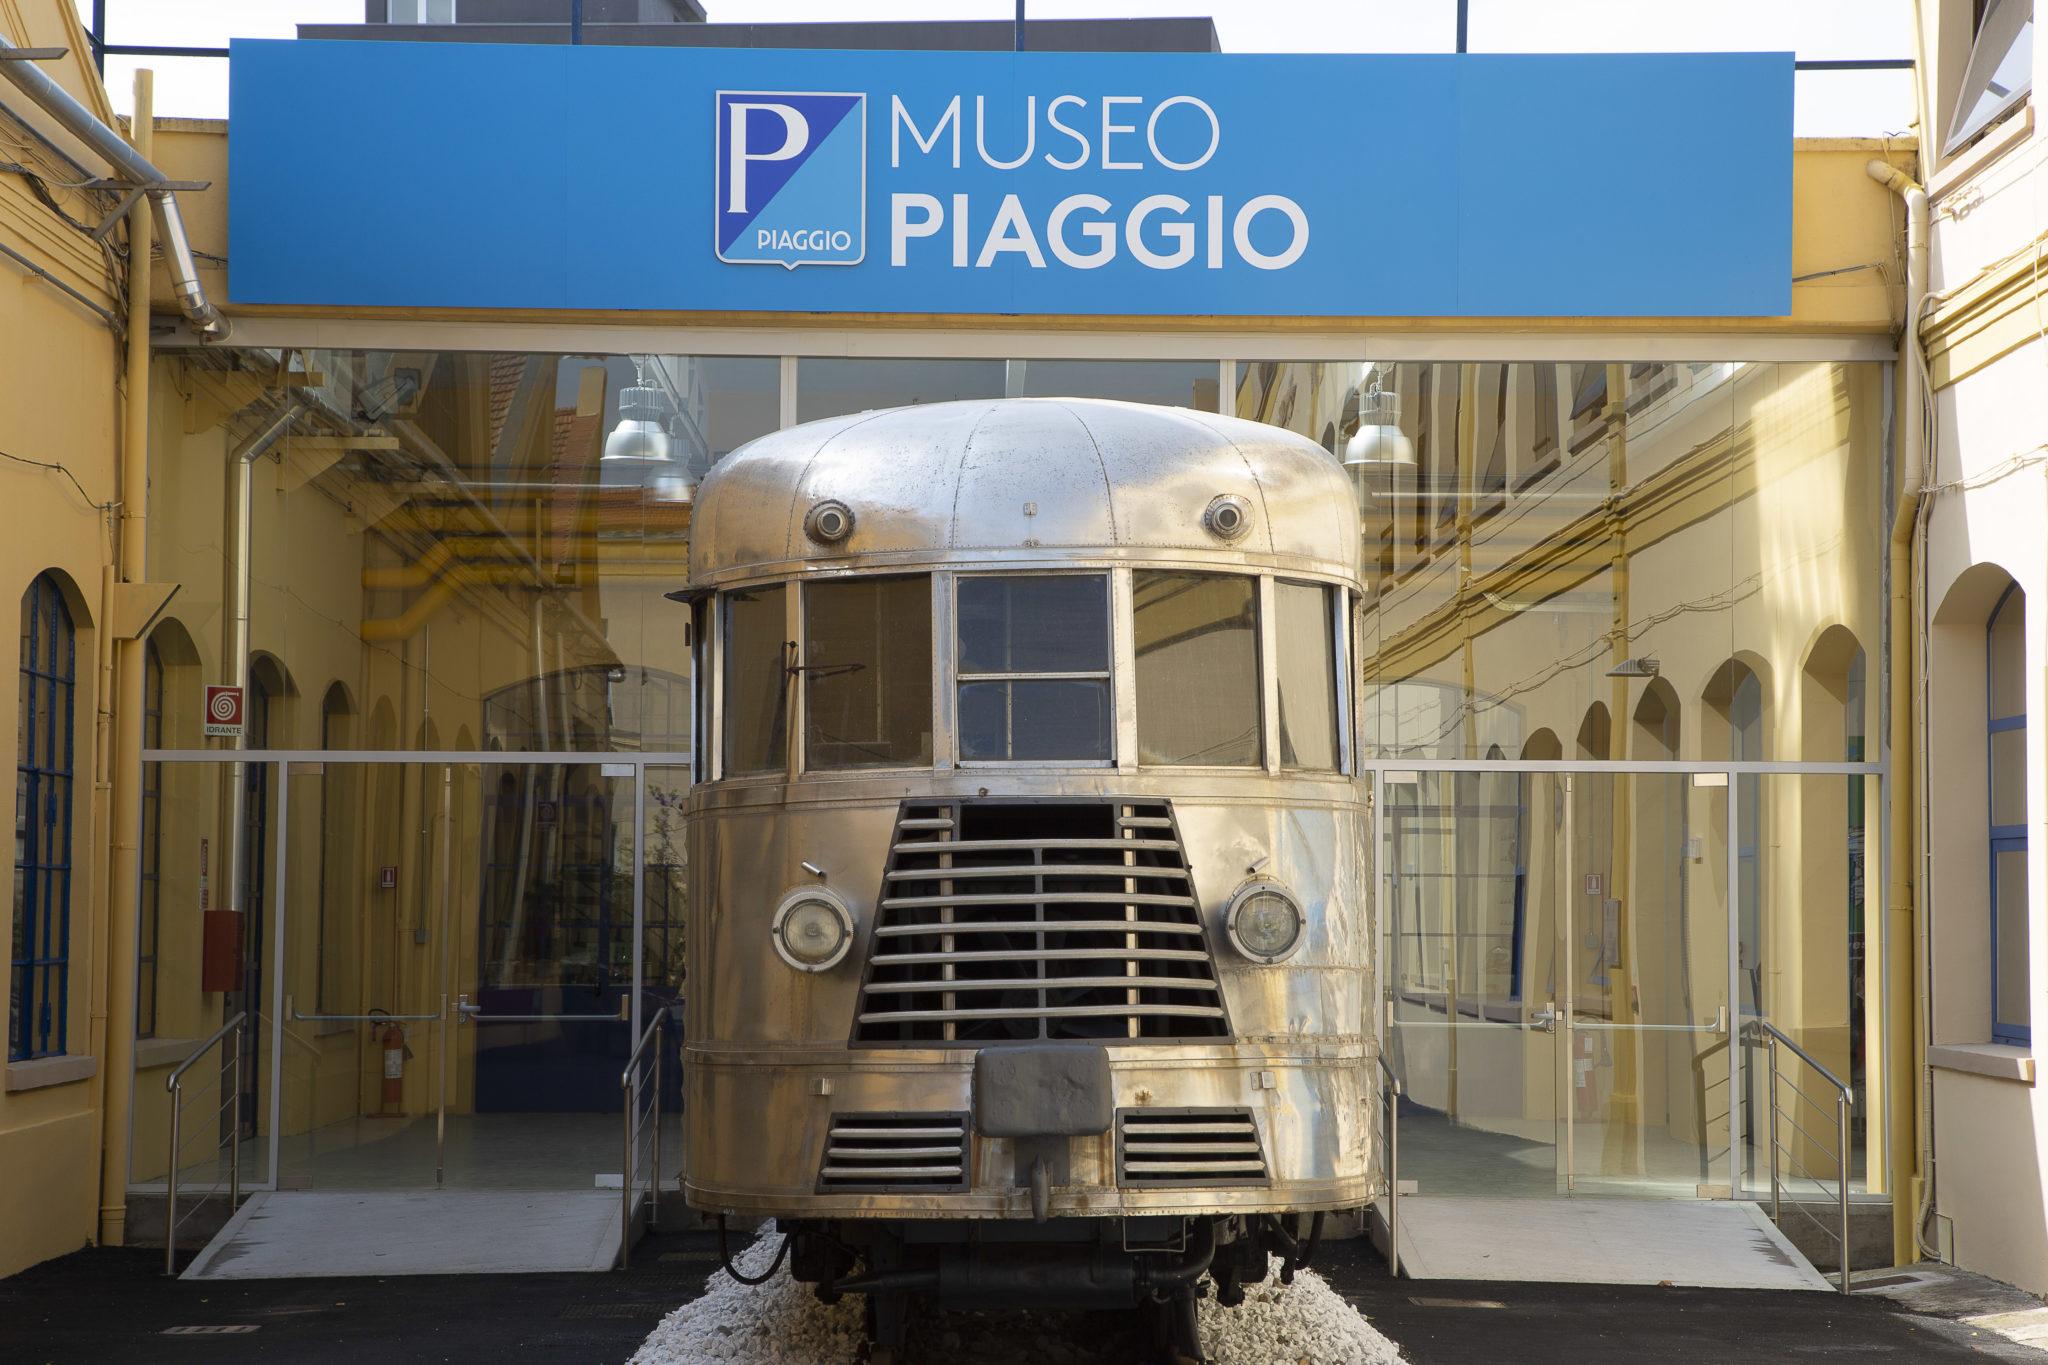 Museo Piaggio Room Tram LoveITALIA